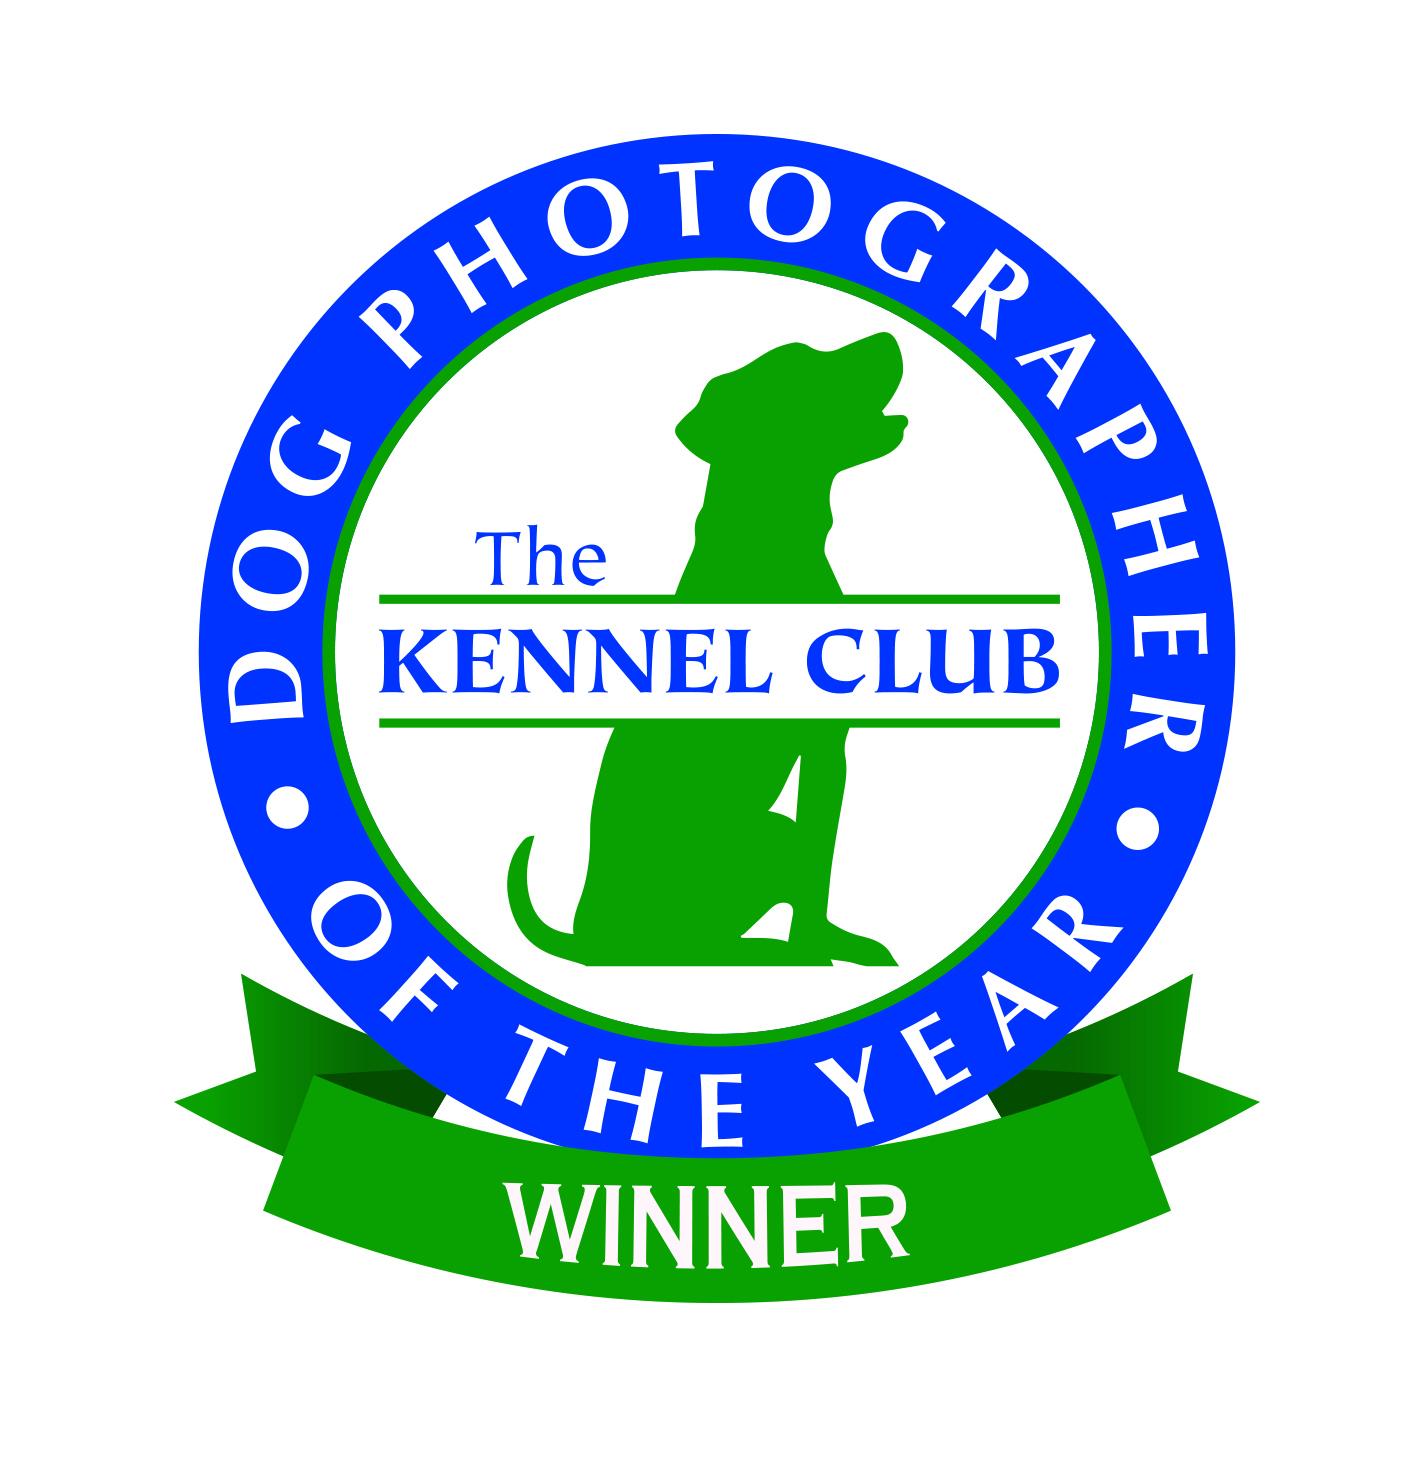 DPOTY_Official Winner Logo_The Kennel Club©.jpg